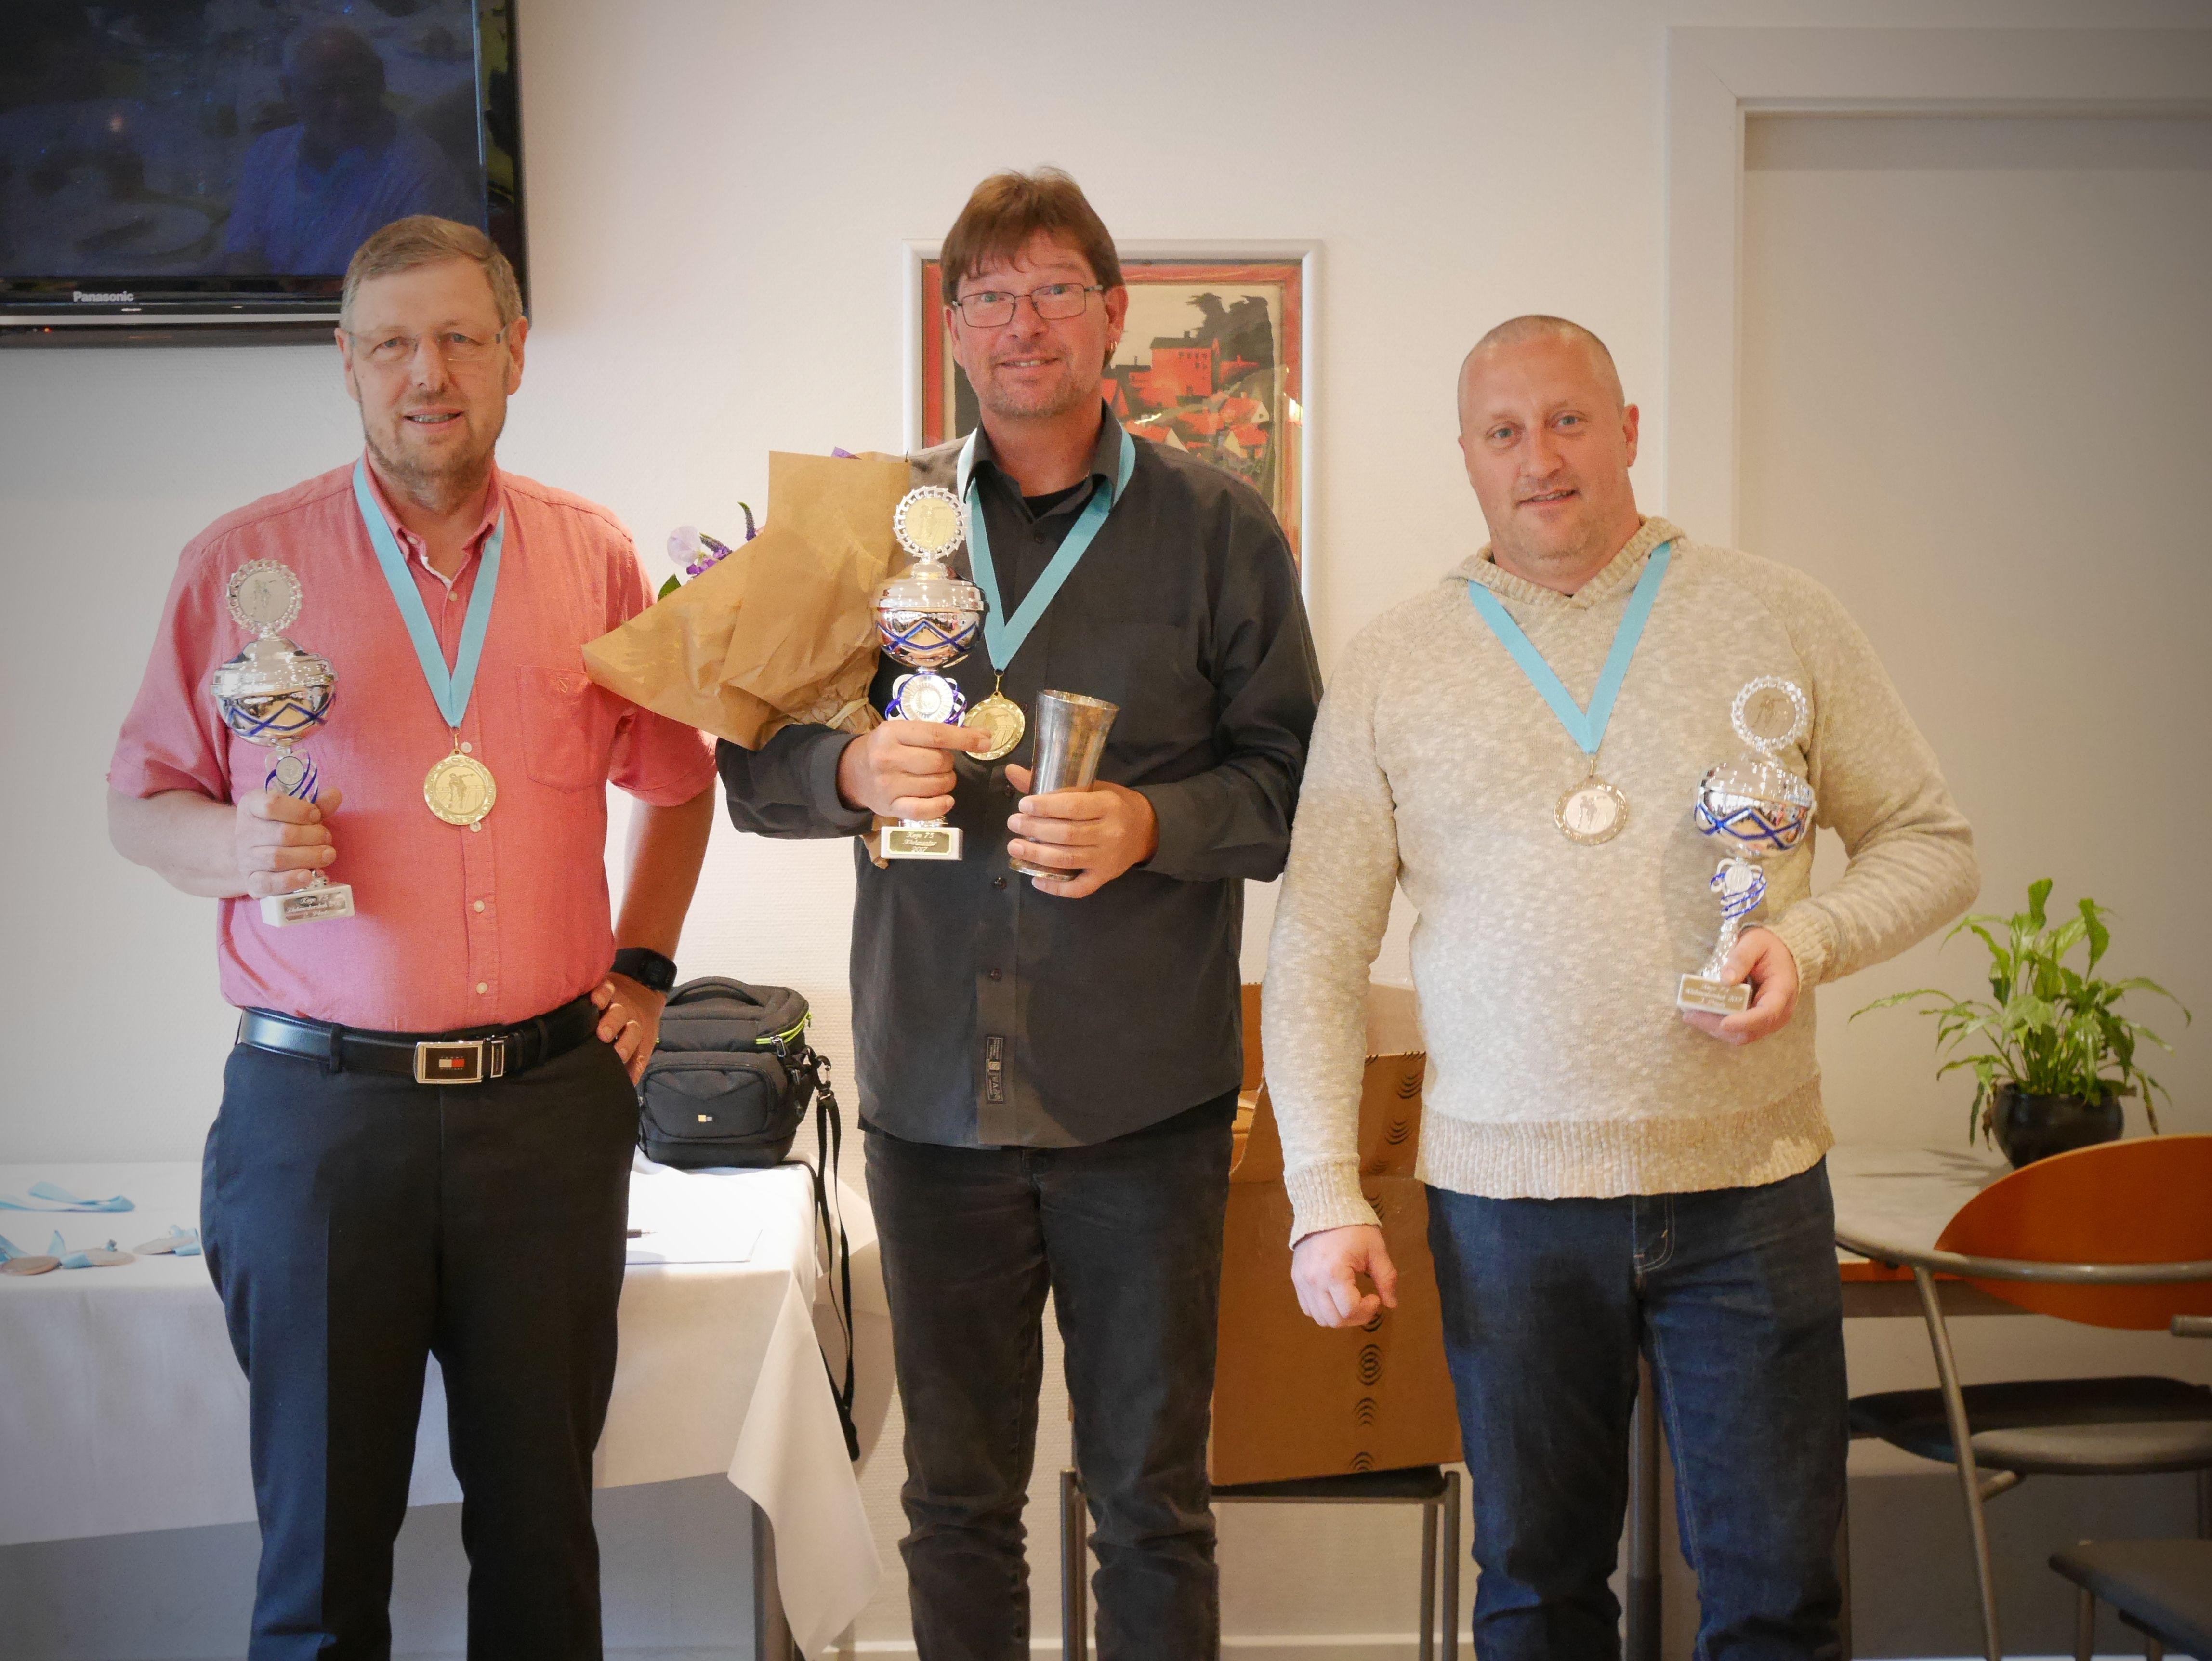 Klubmester Herrer Guld til Allan Kaurin, Sølv til Per L. Sørensen og bronze til Martin Reuther